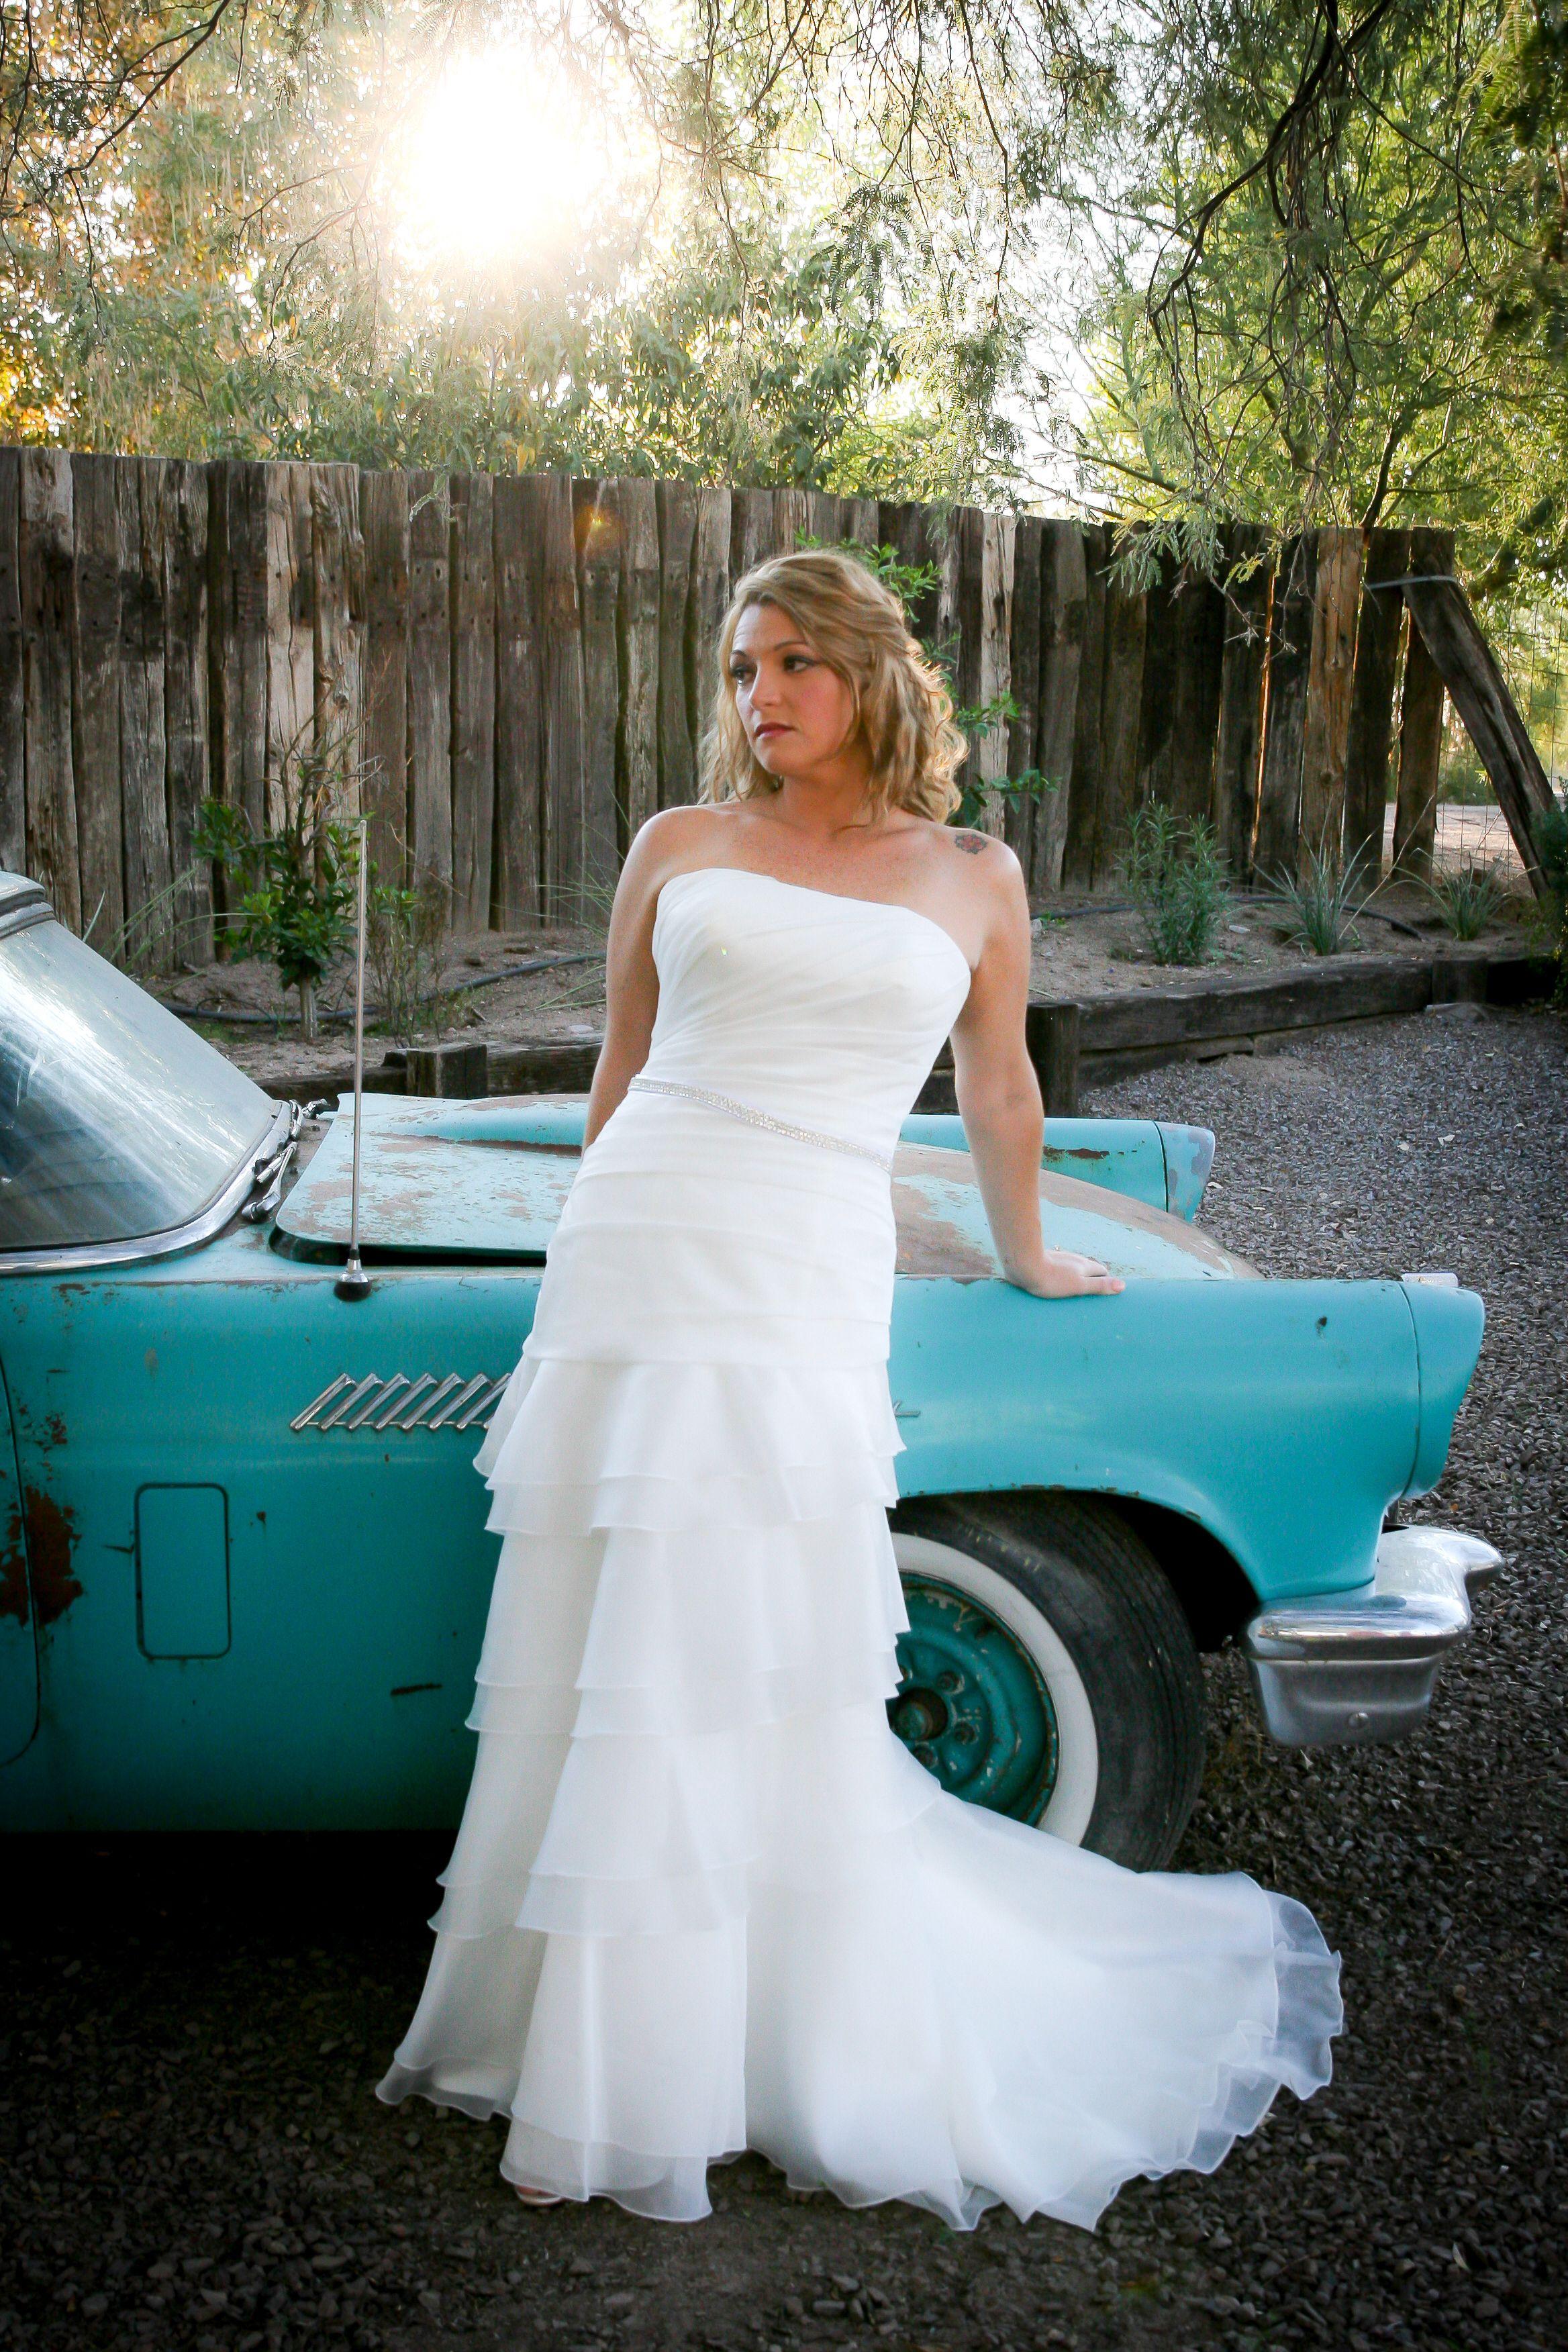 The dress. Rustic wedding dress, layered wedding dress | Wed Photo ...